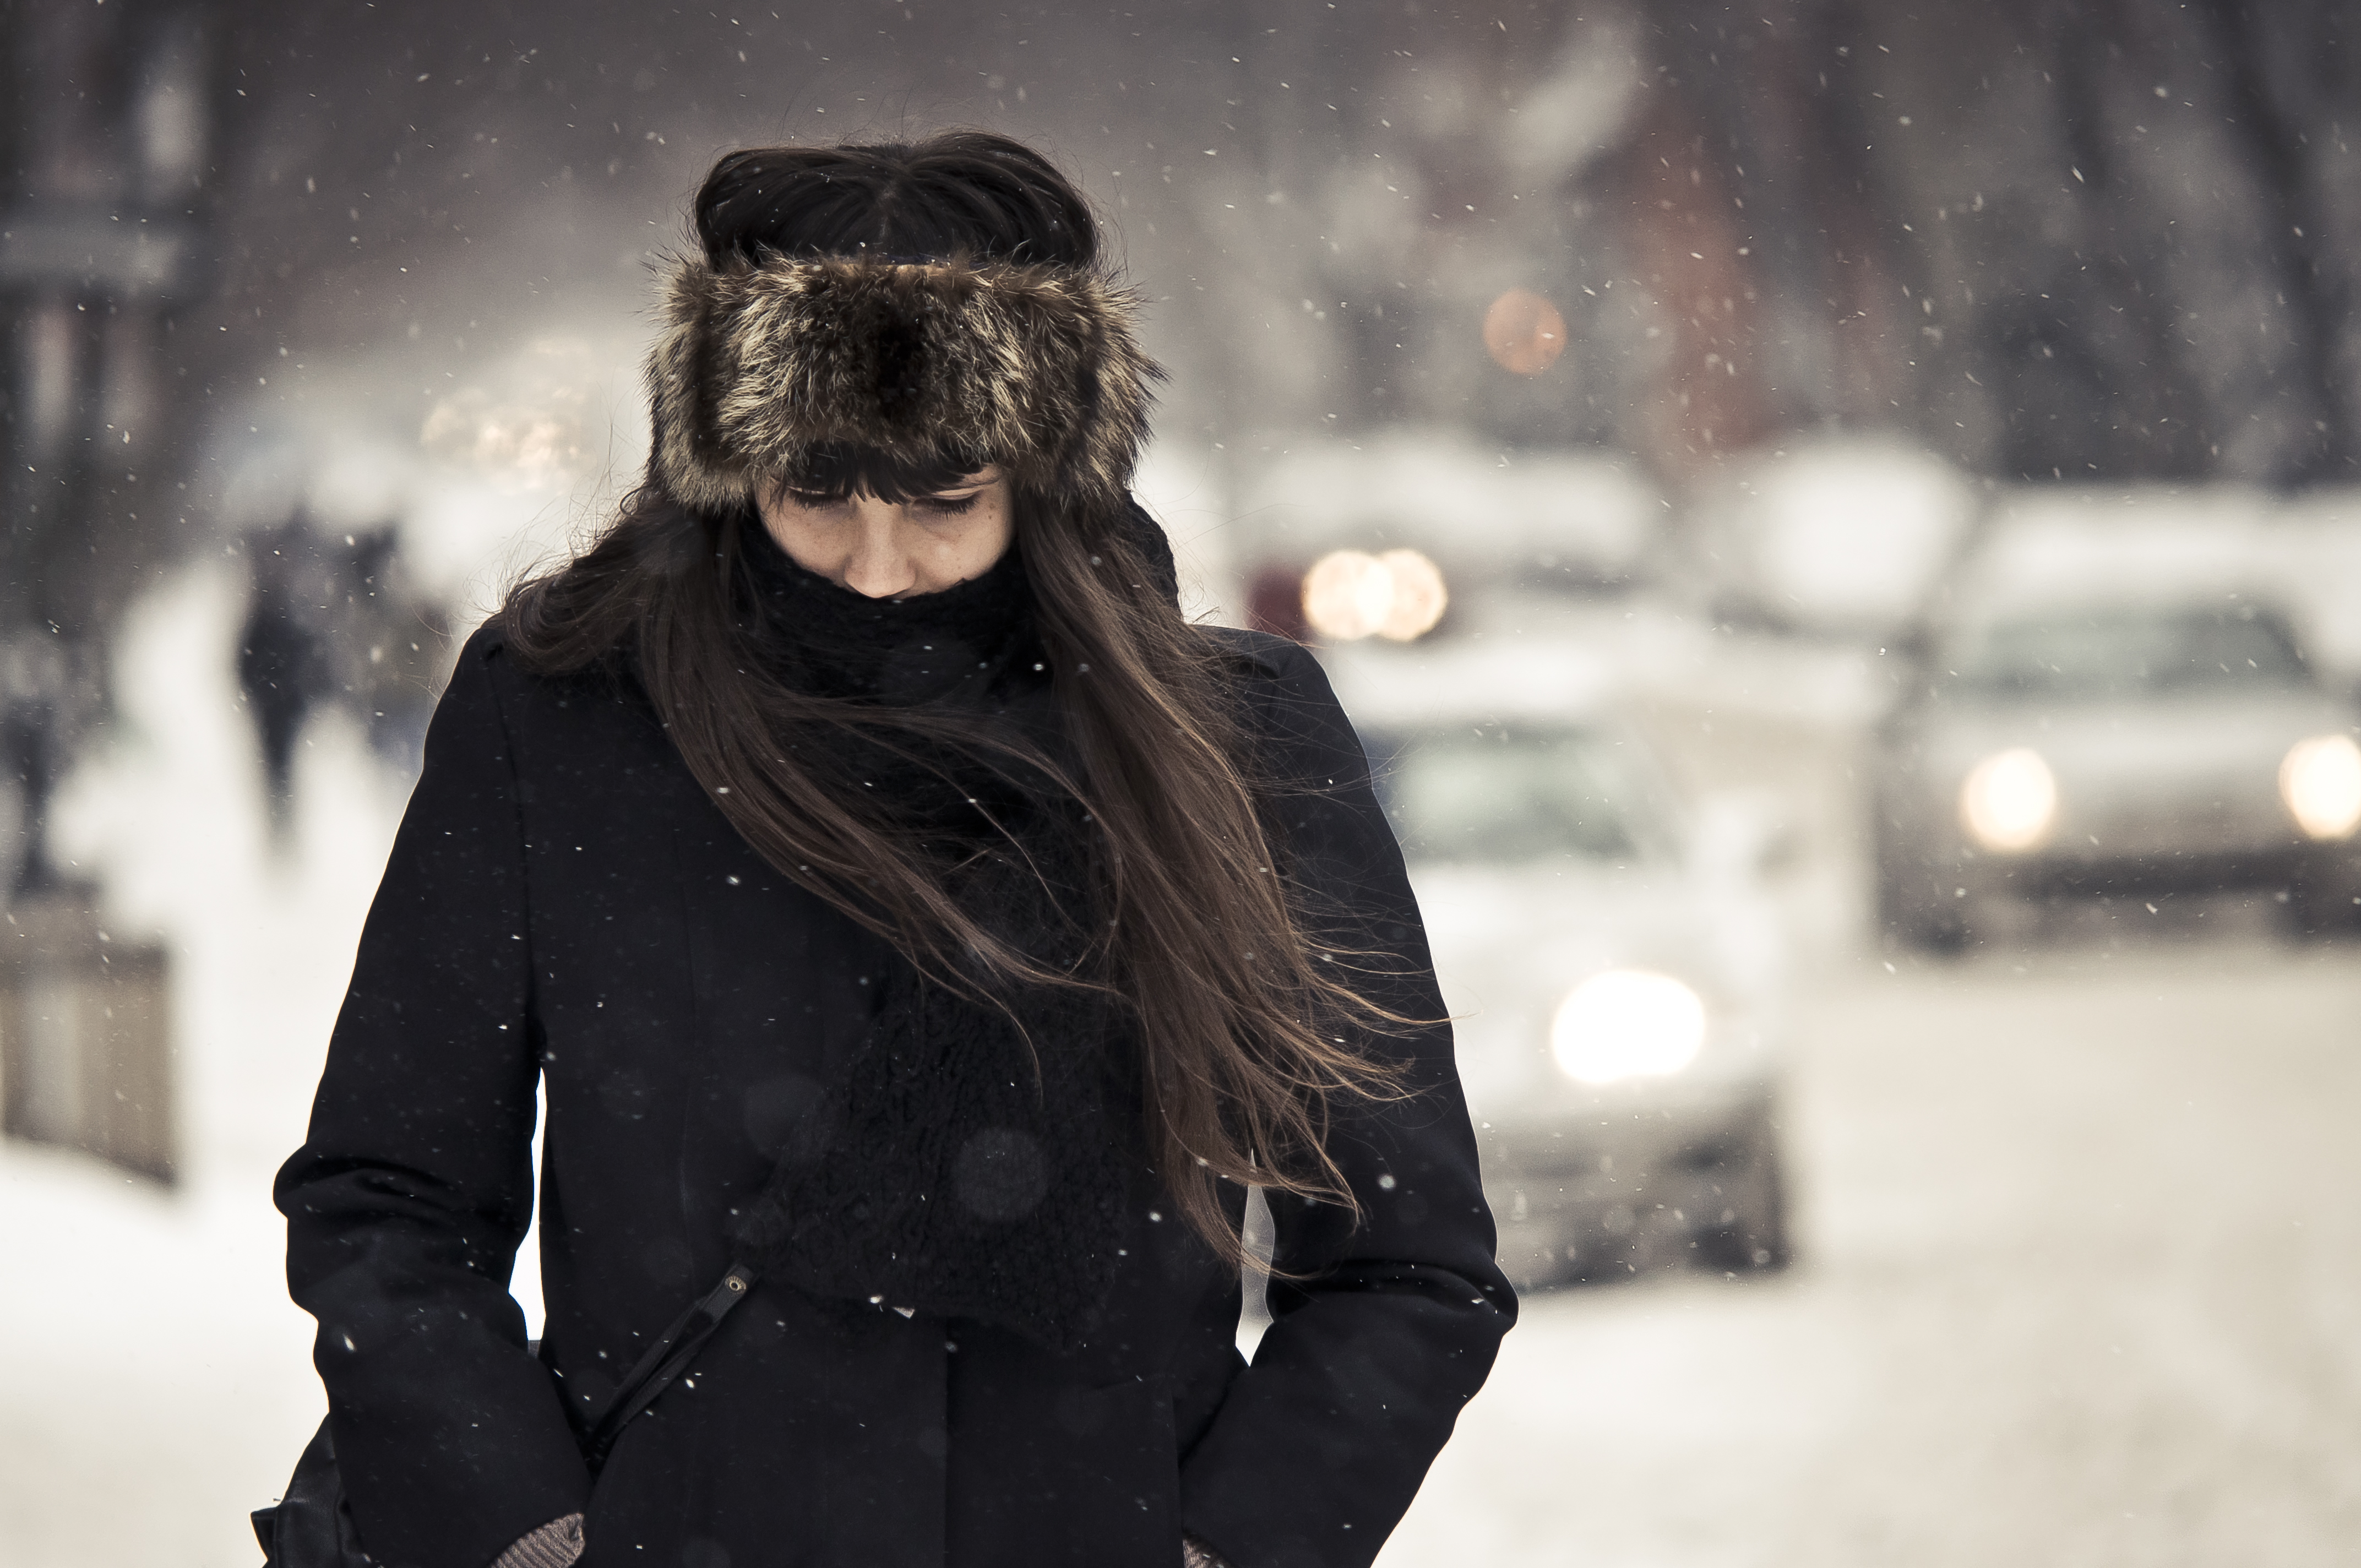 devushki-foto-zimoy-so-spini-shatenka-erotik-foto-iz-filmov